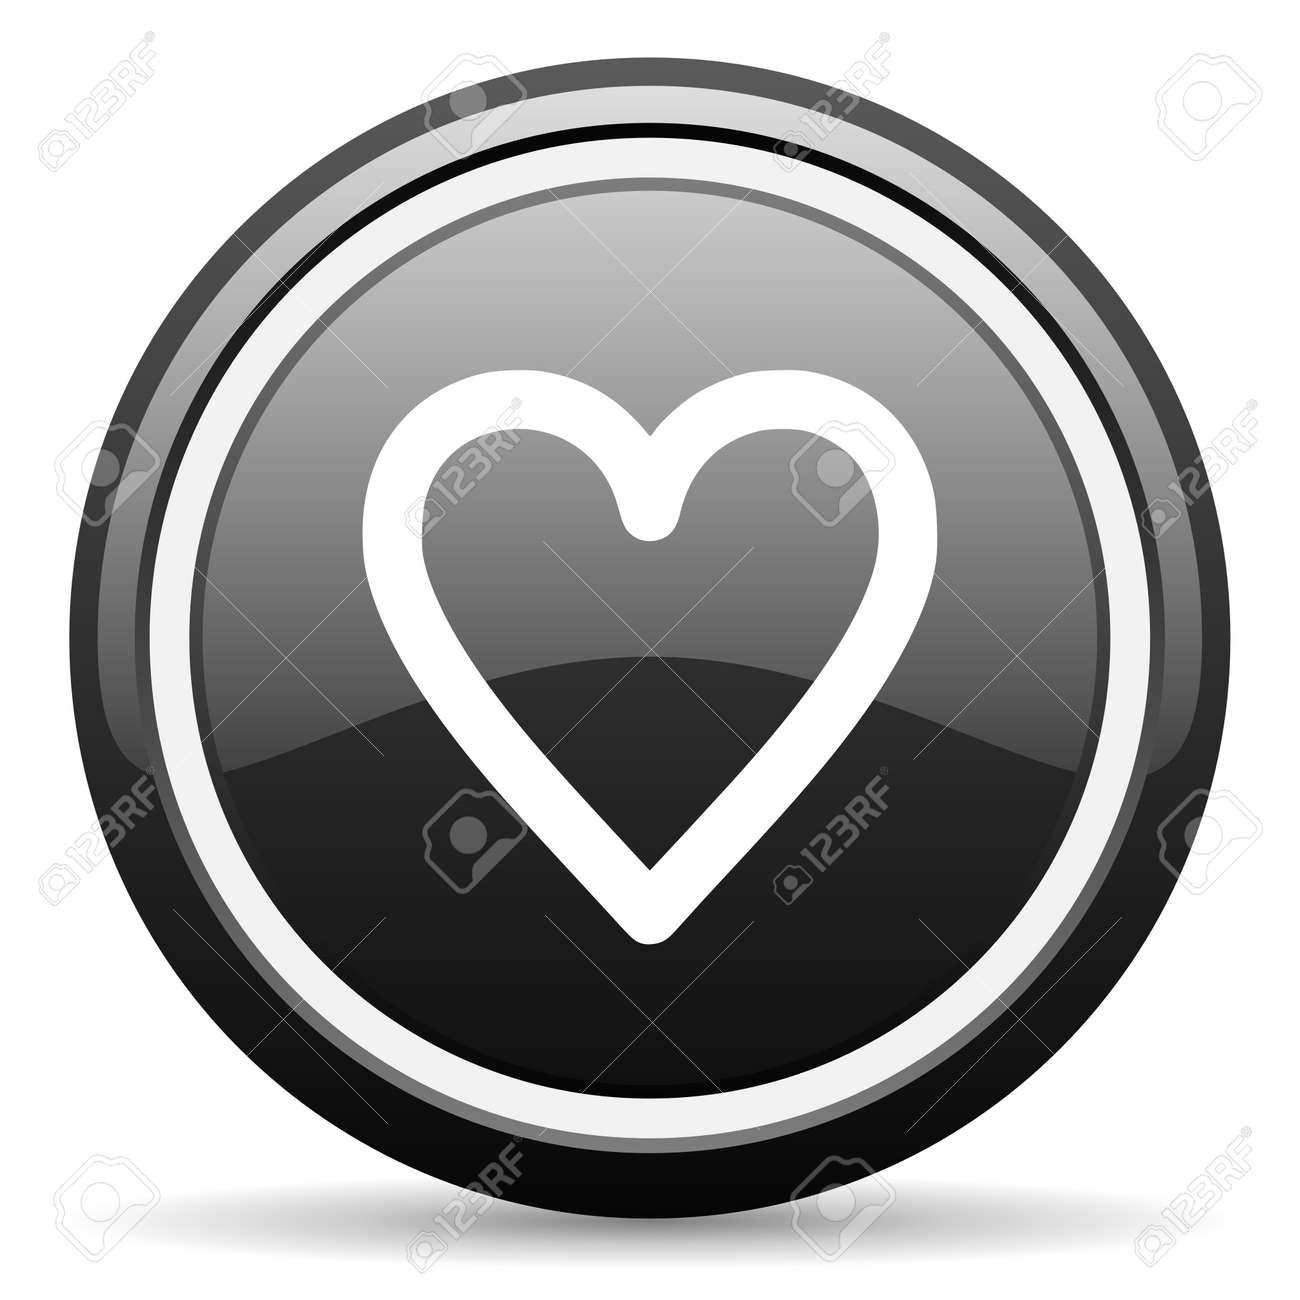 heart black glossy icon on white background Stock Photo - 17087335